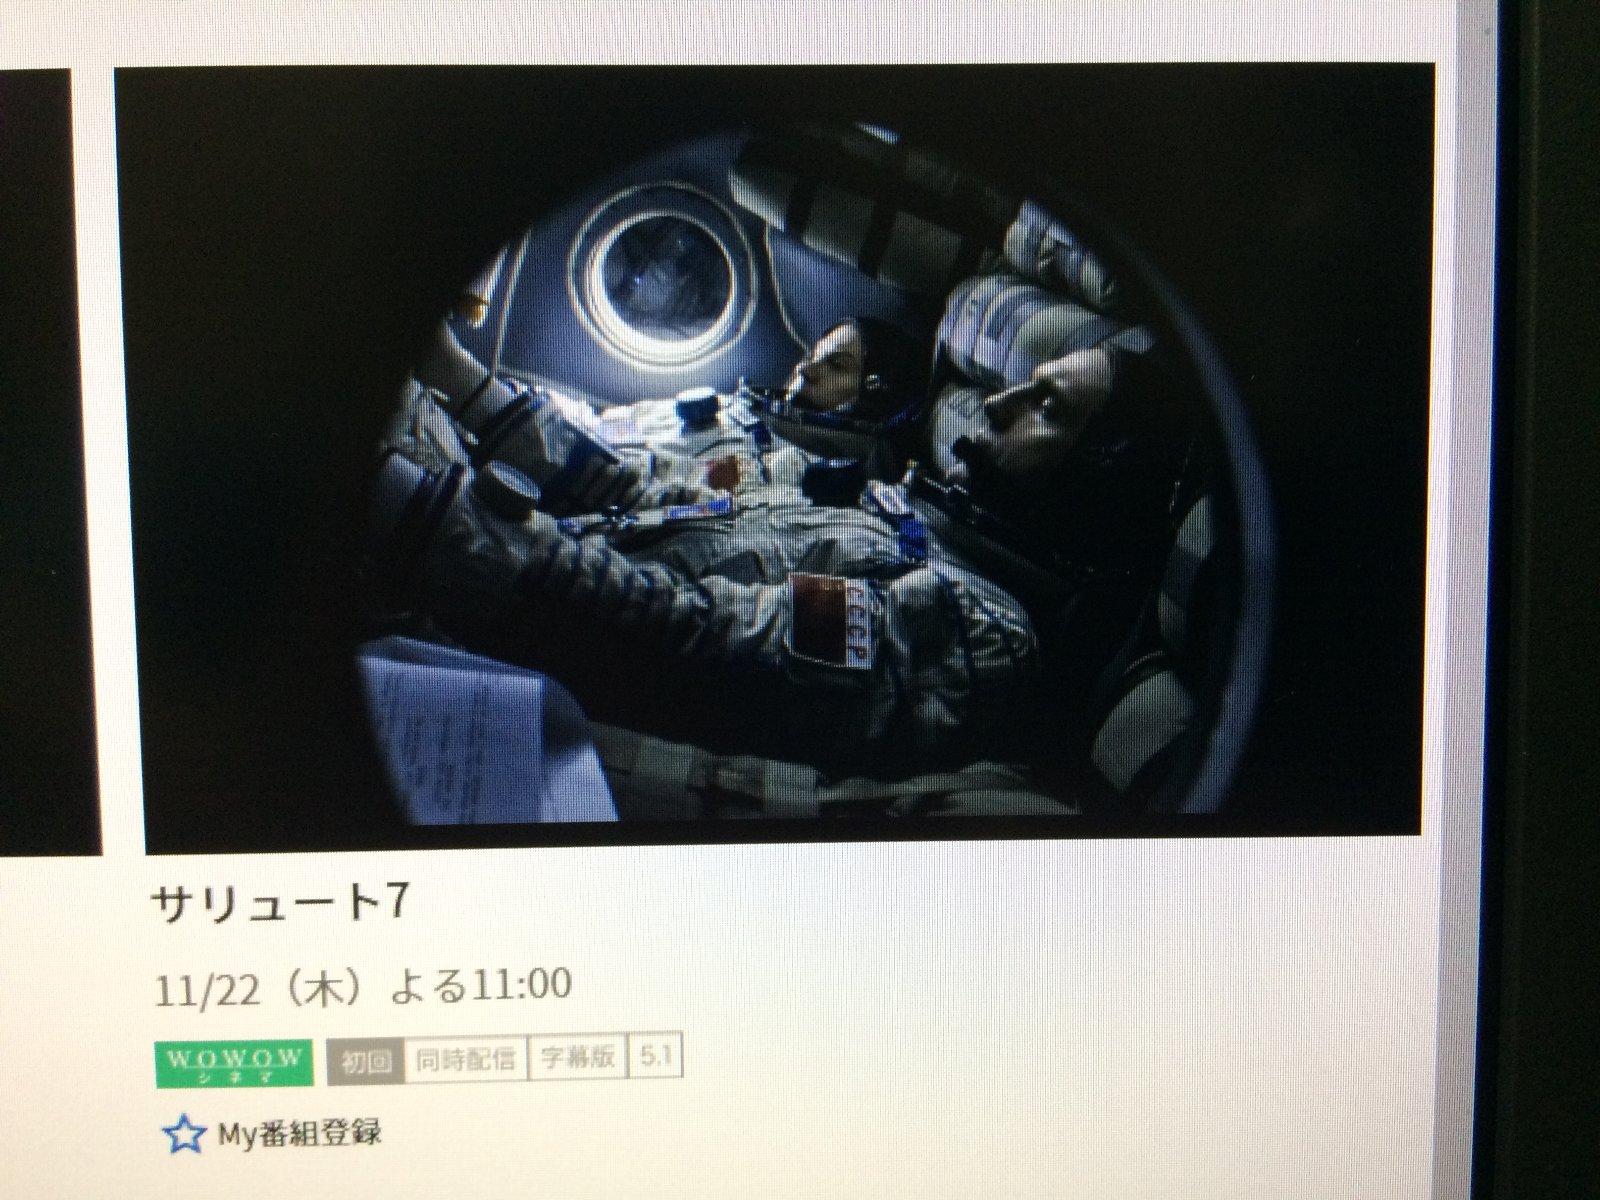 WOWOW映画放映予定「サリュート7」